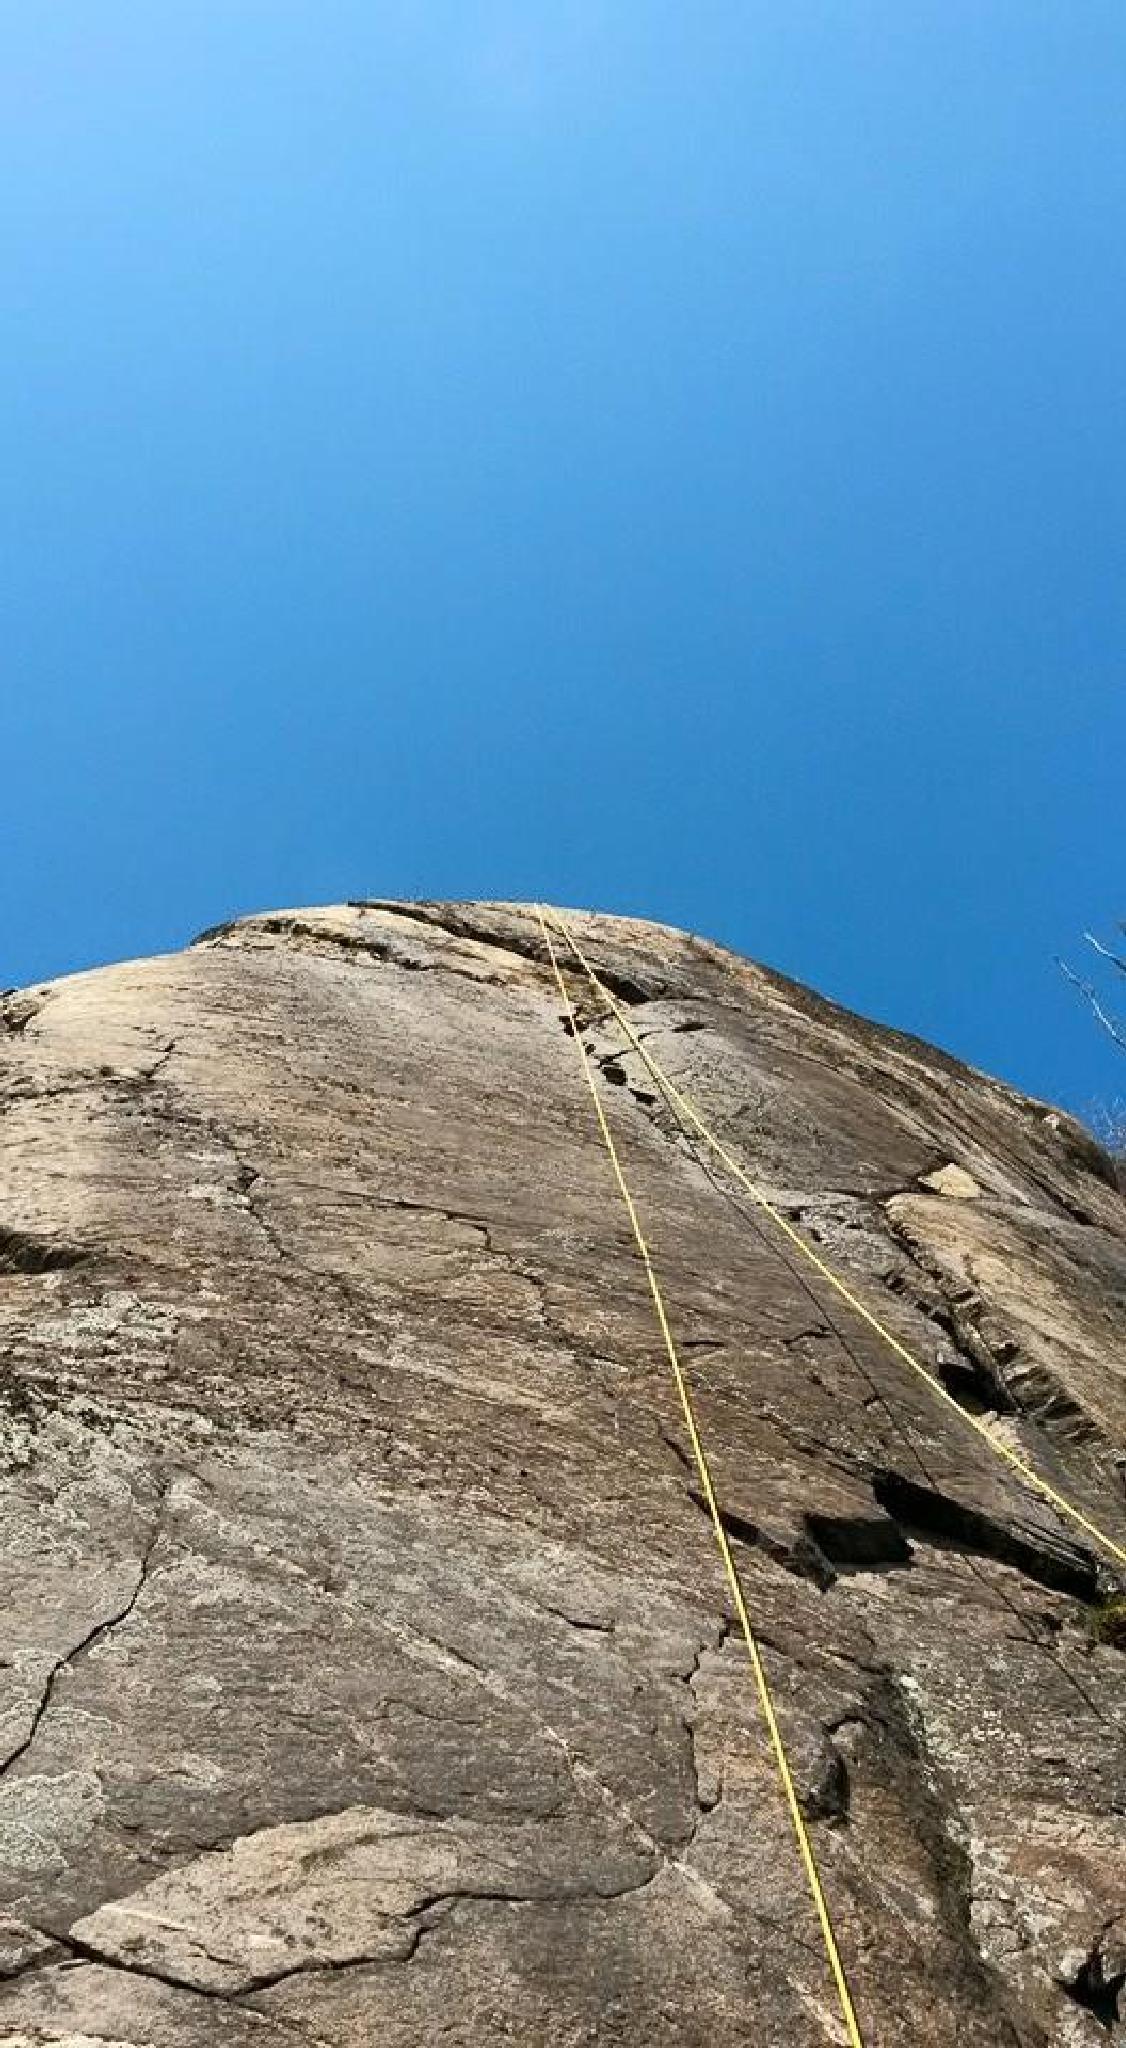 Nice day to climb some rocks :-) by Micke